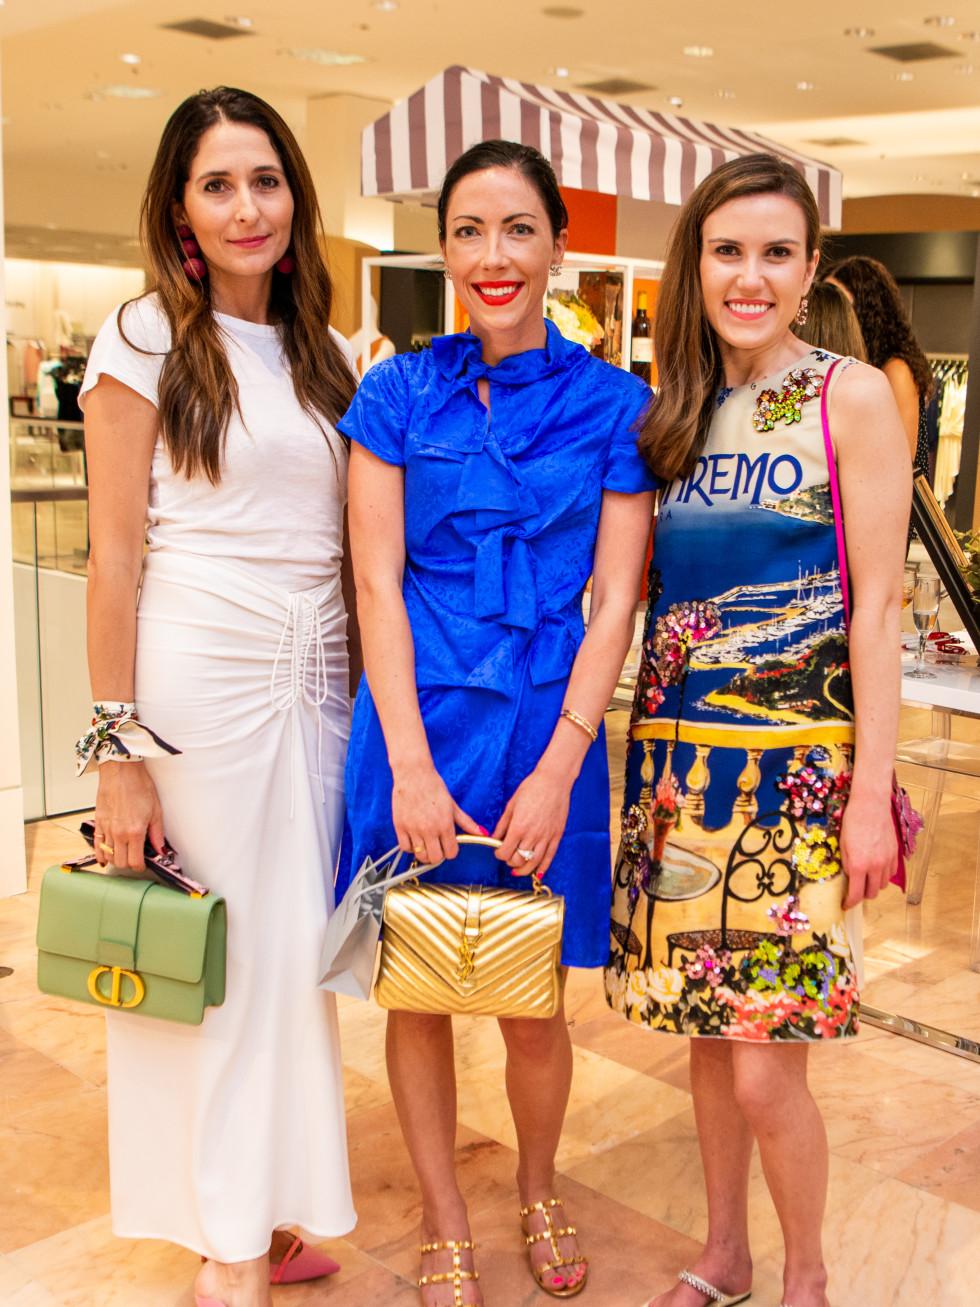 ICCC La Dolce Vita Neiman Marcus 2021 Tara Martin, Lauren Abbott, Heather Almond